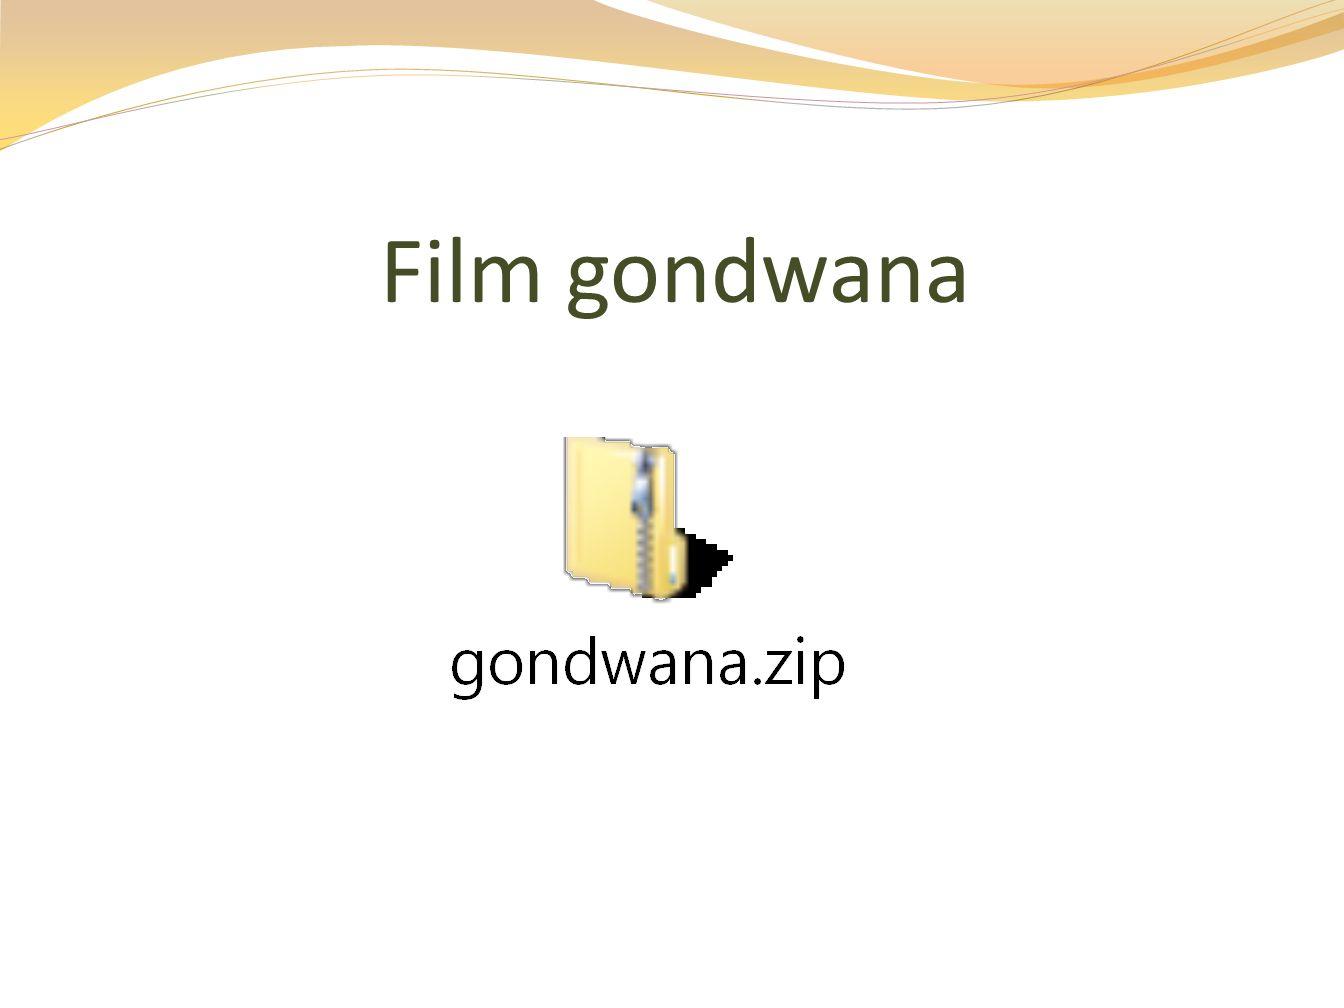 Film gondwana